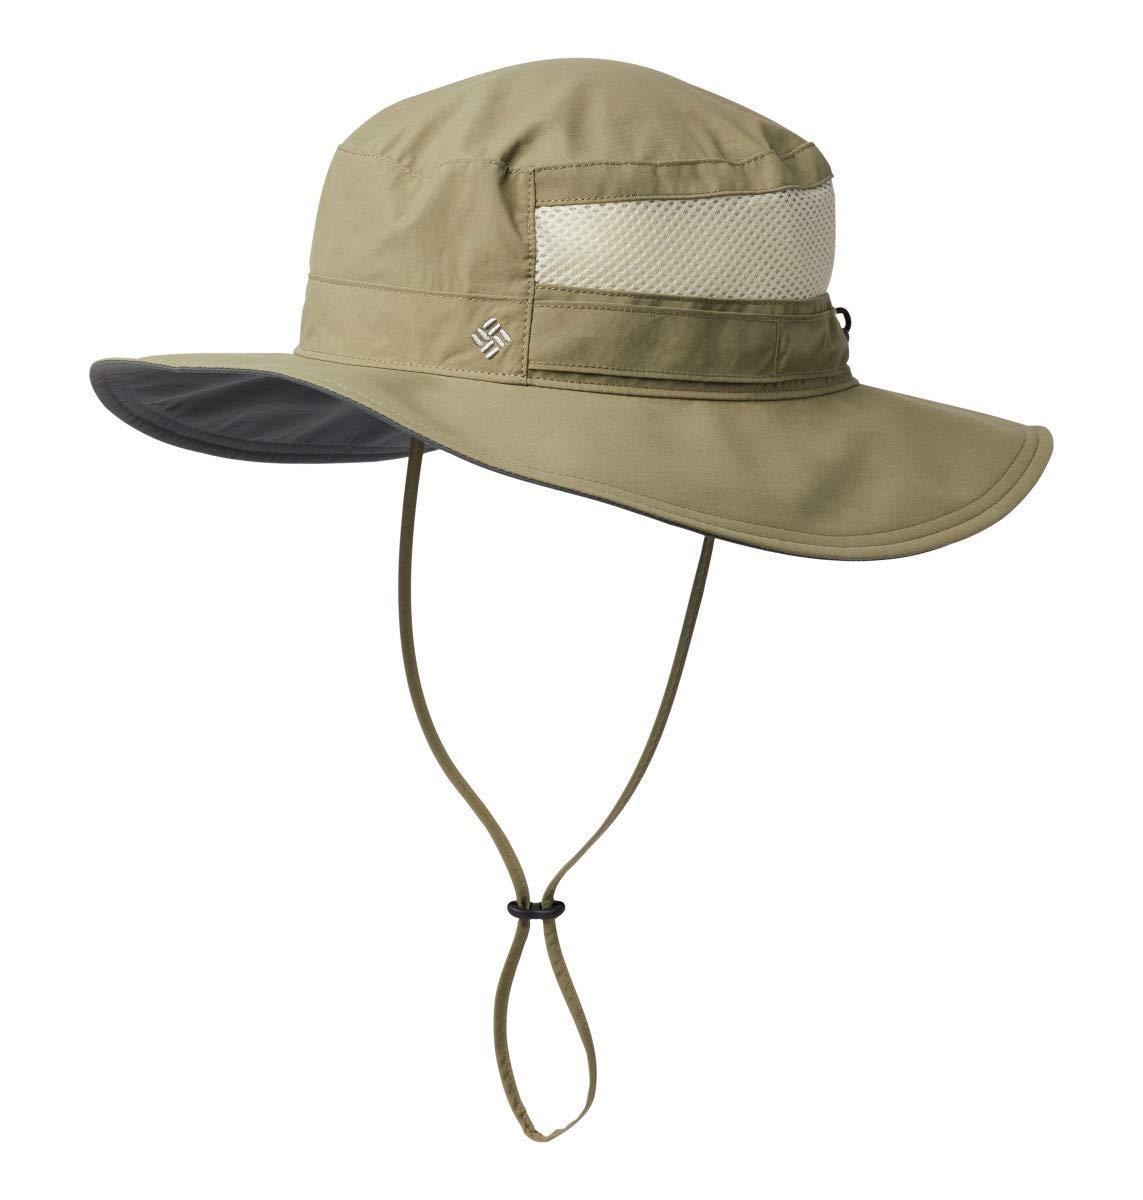 Columbia Unisex Bora Bora II Booney Hat, Moisture Wicking Fabric, UV Sun Protection, Sage, One Size by Columbia